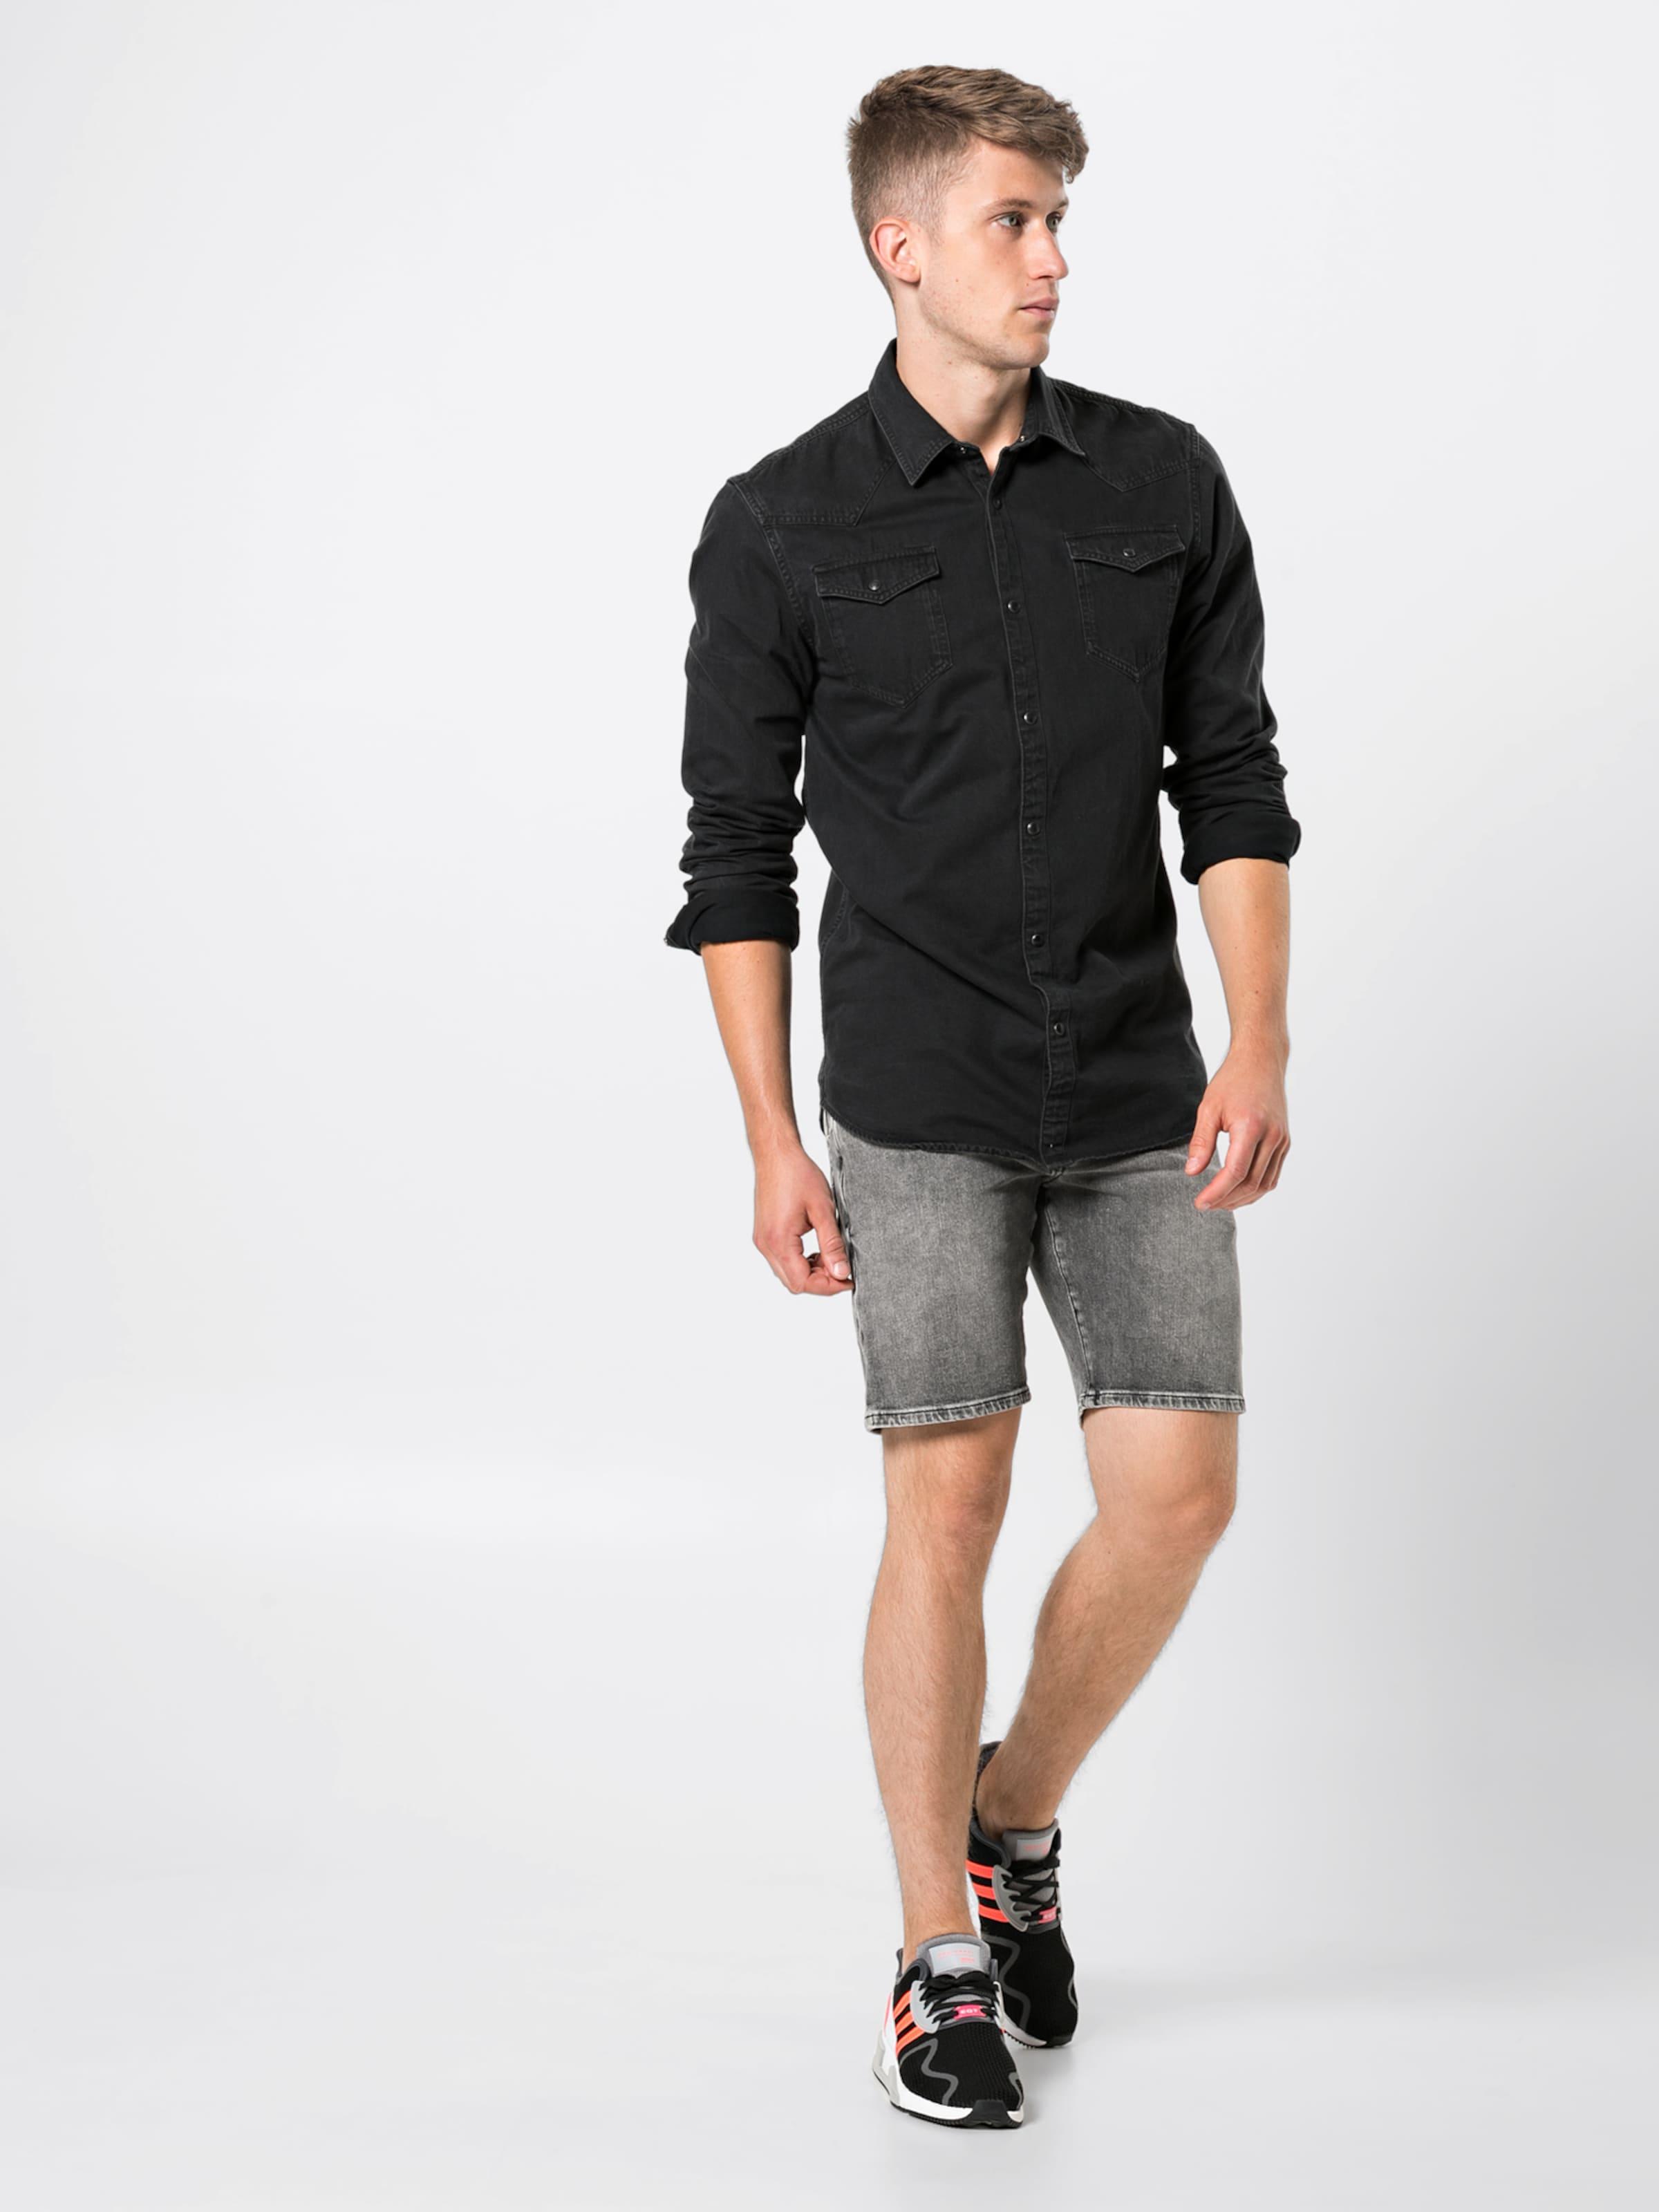 Wa' Hemd Ams Soda 'slim Easy Western Dunkelgrau Fit Blauw Scotchamp; Authentic In Simple Shirt 4A35ScqRjL